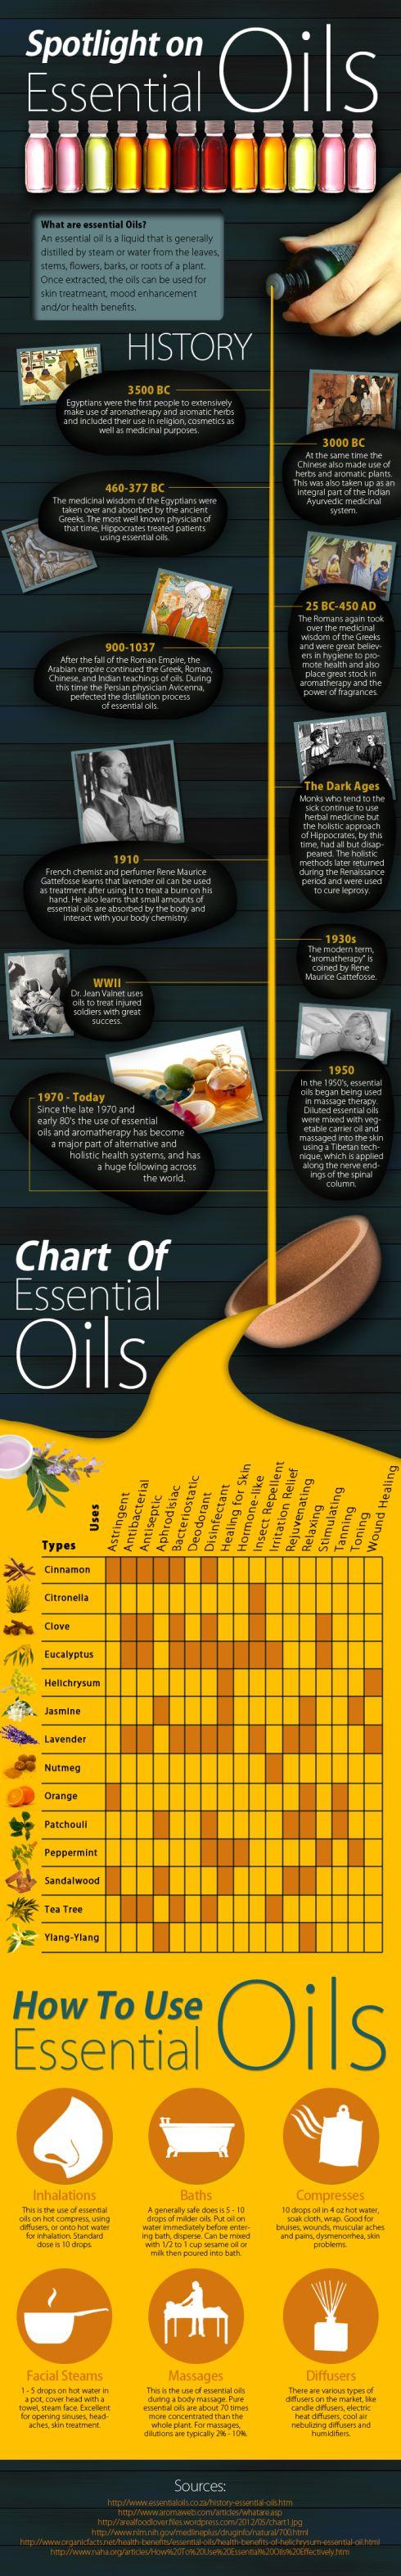 Aceites esenciales #infographic #oil